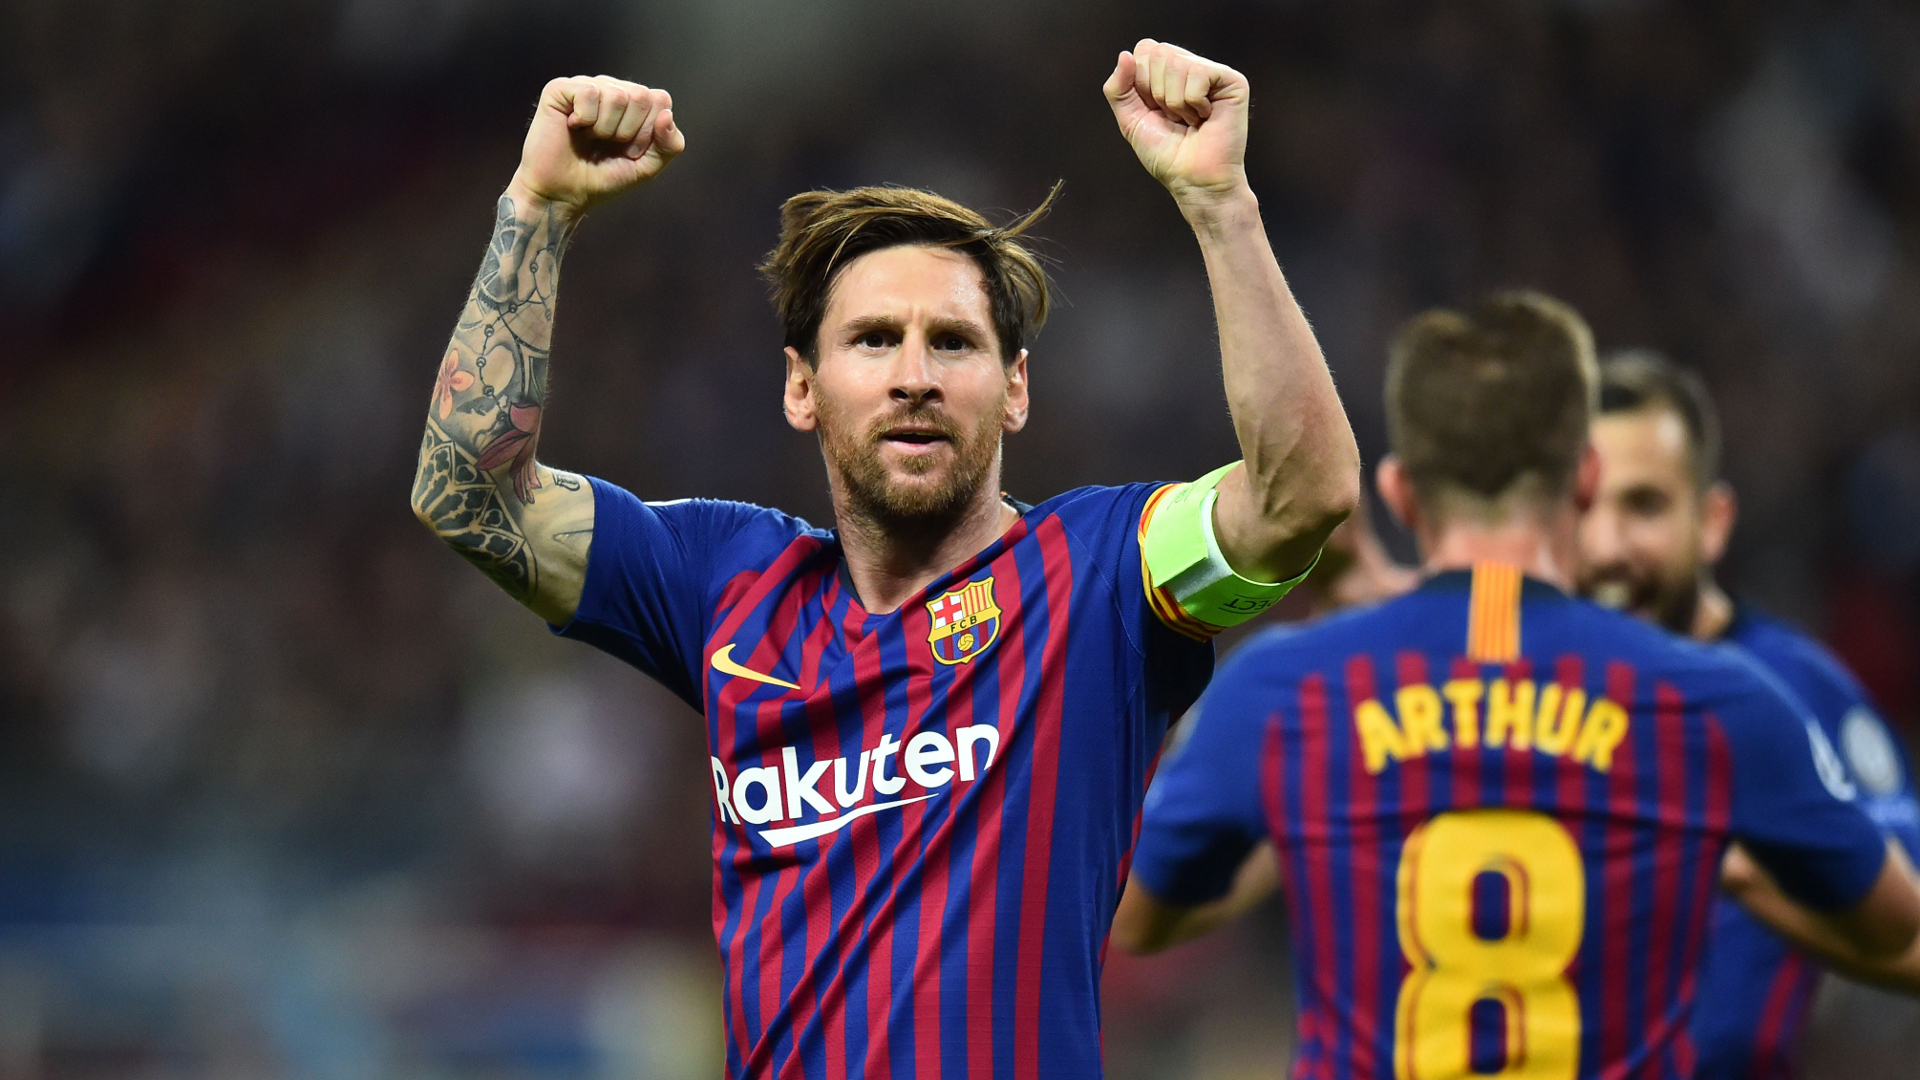 رقم جديد لنجم برشلونة: ميسي يعادل رقم كريستيانو رونالدو بـ 105 هدف